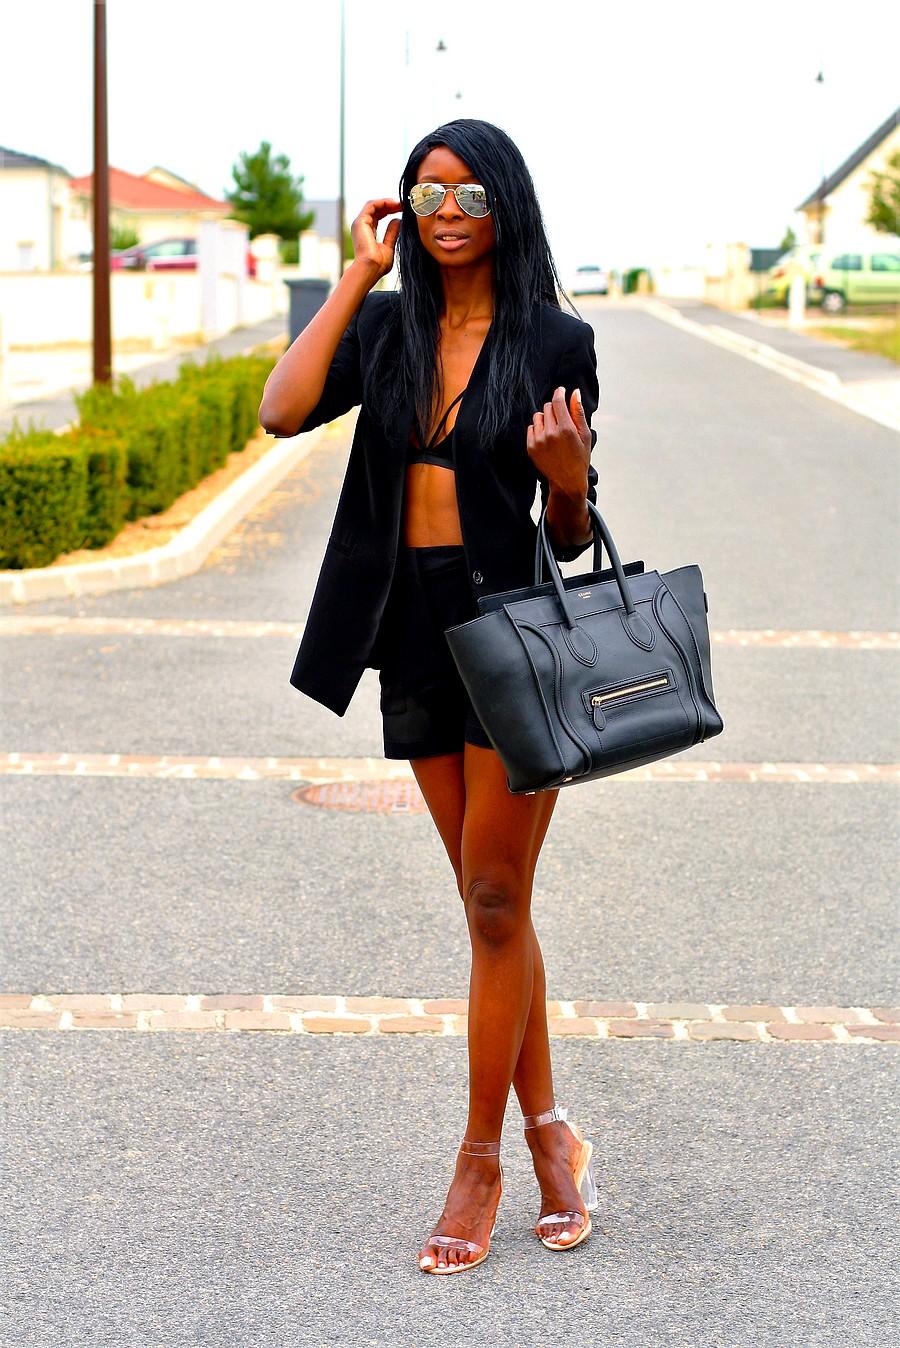 it-shoes-perspex-heels-celine-mini-luggage-highwaist-short-blazer-crop-top-trend